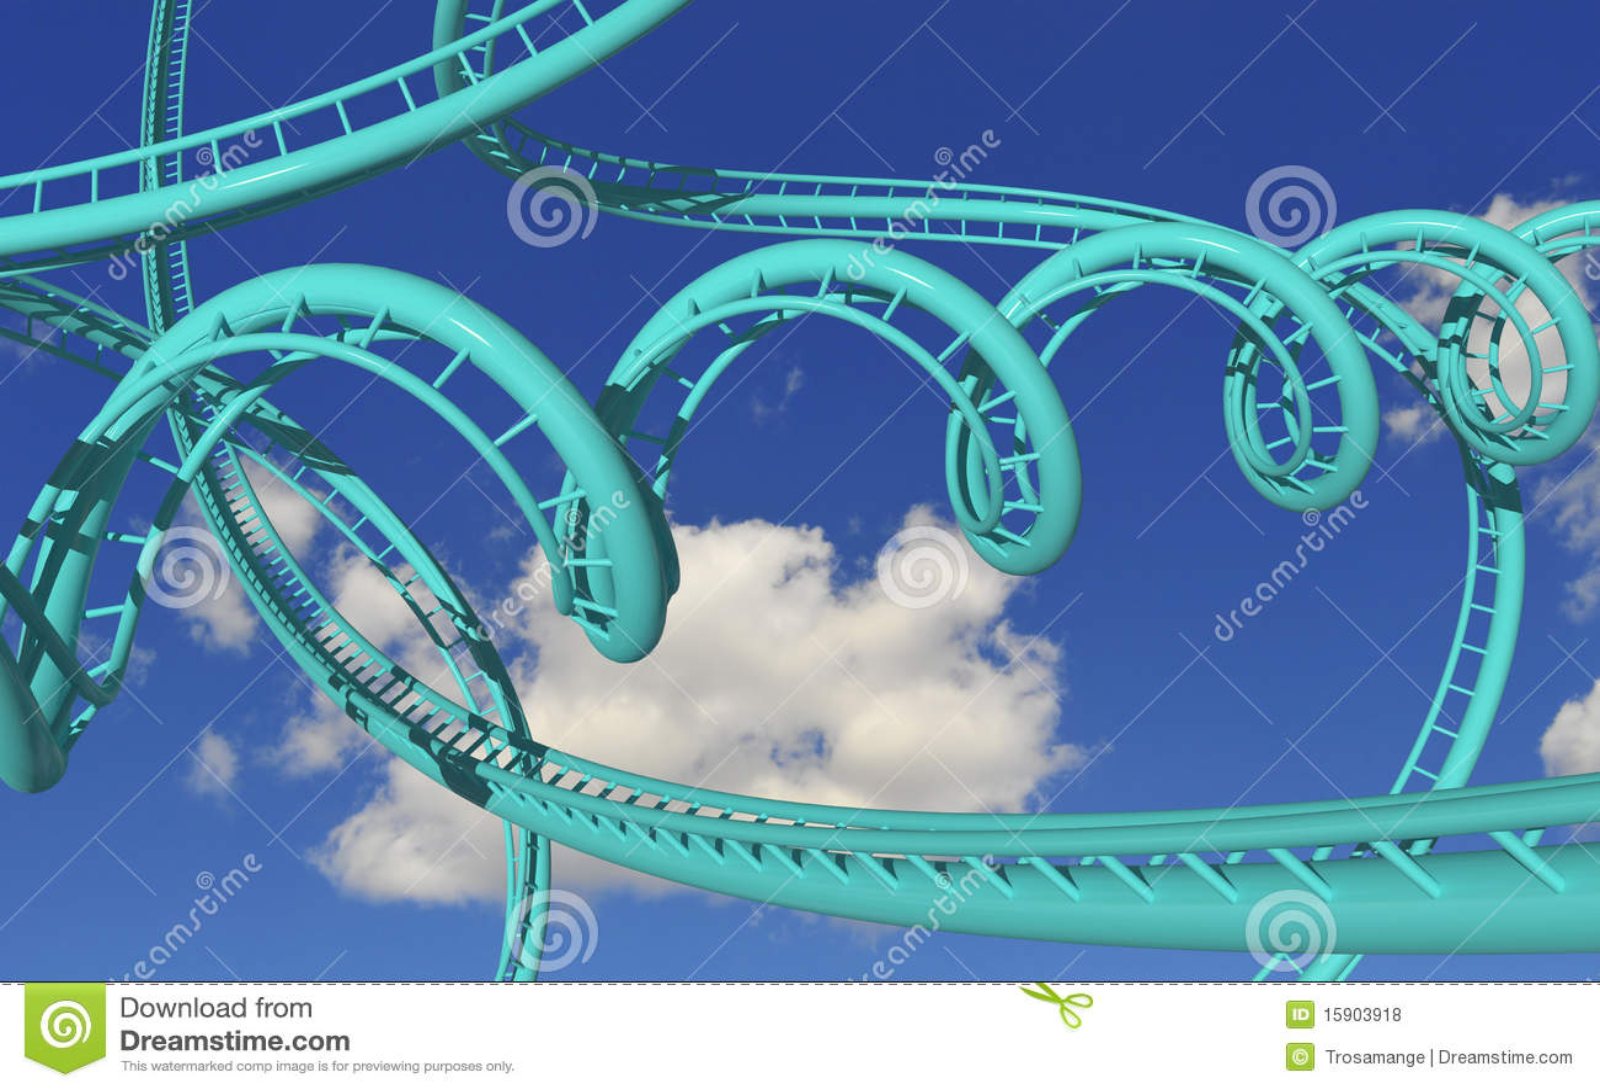 Crazy rollercoaster